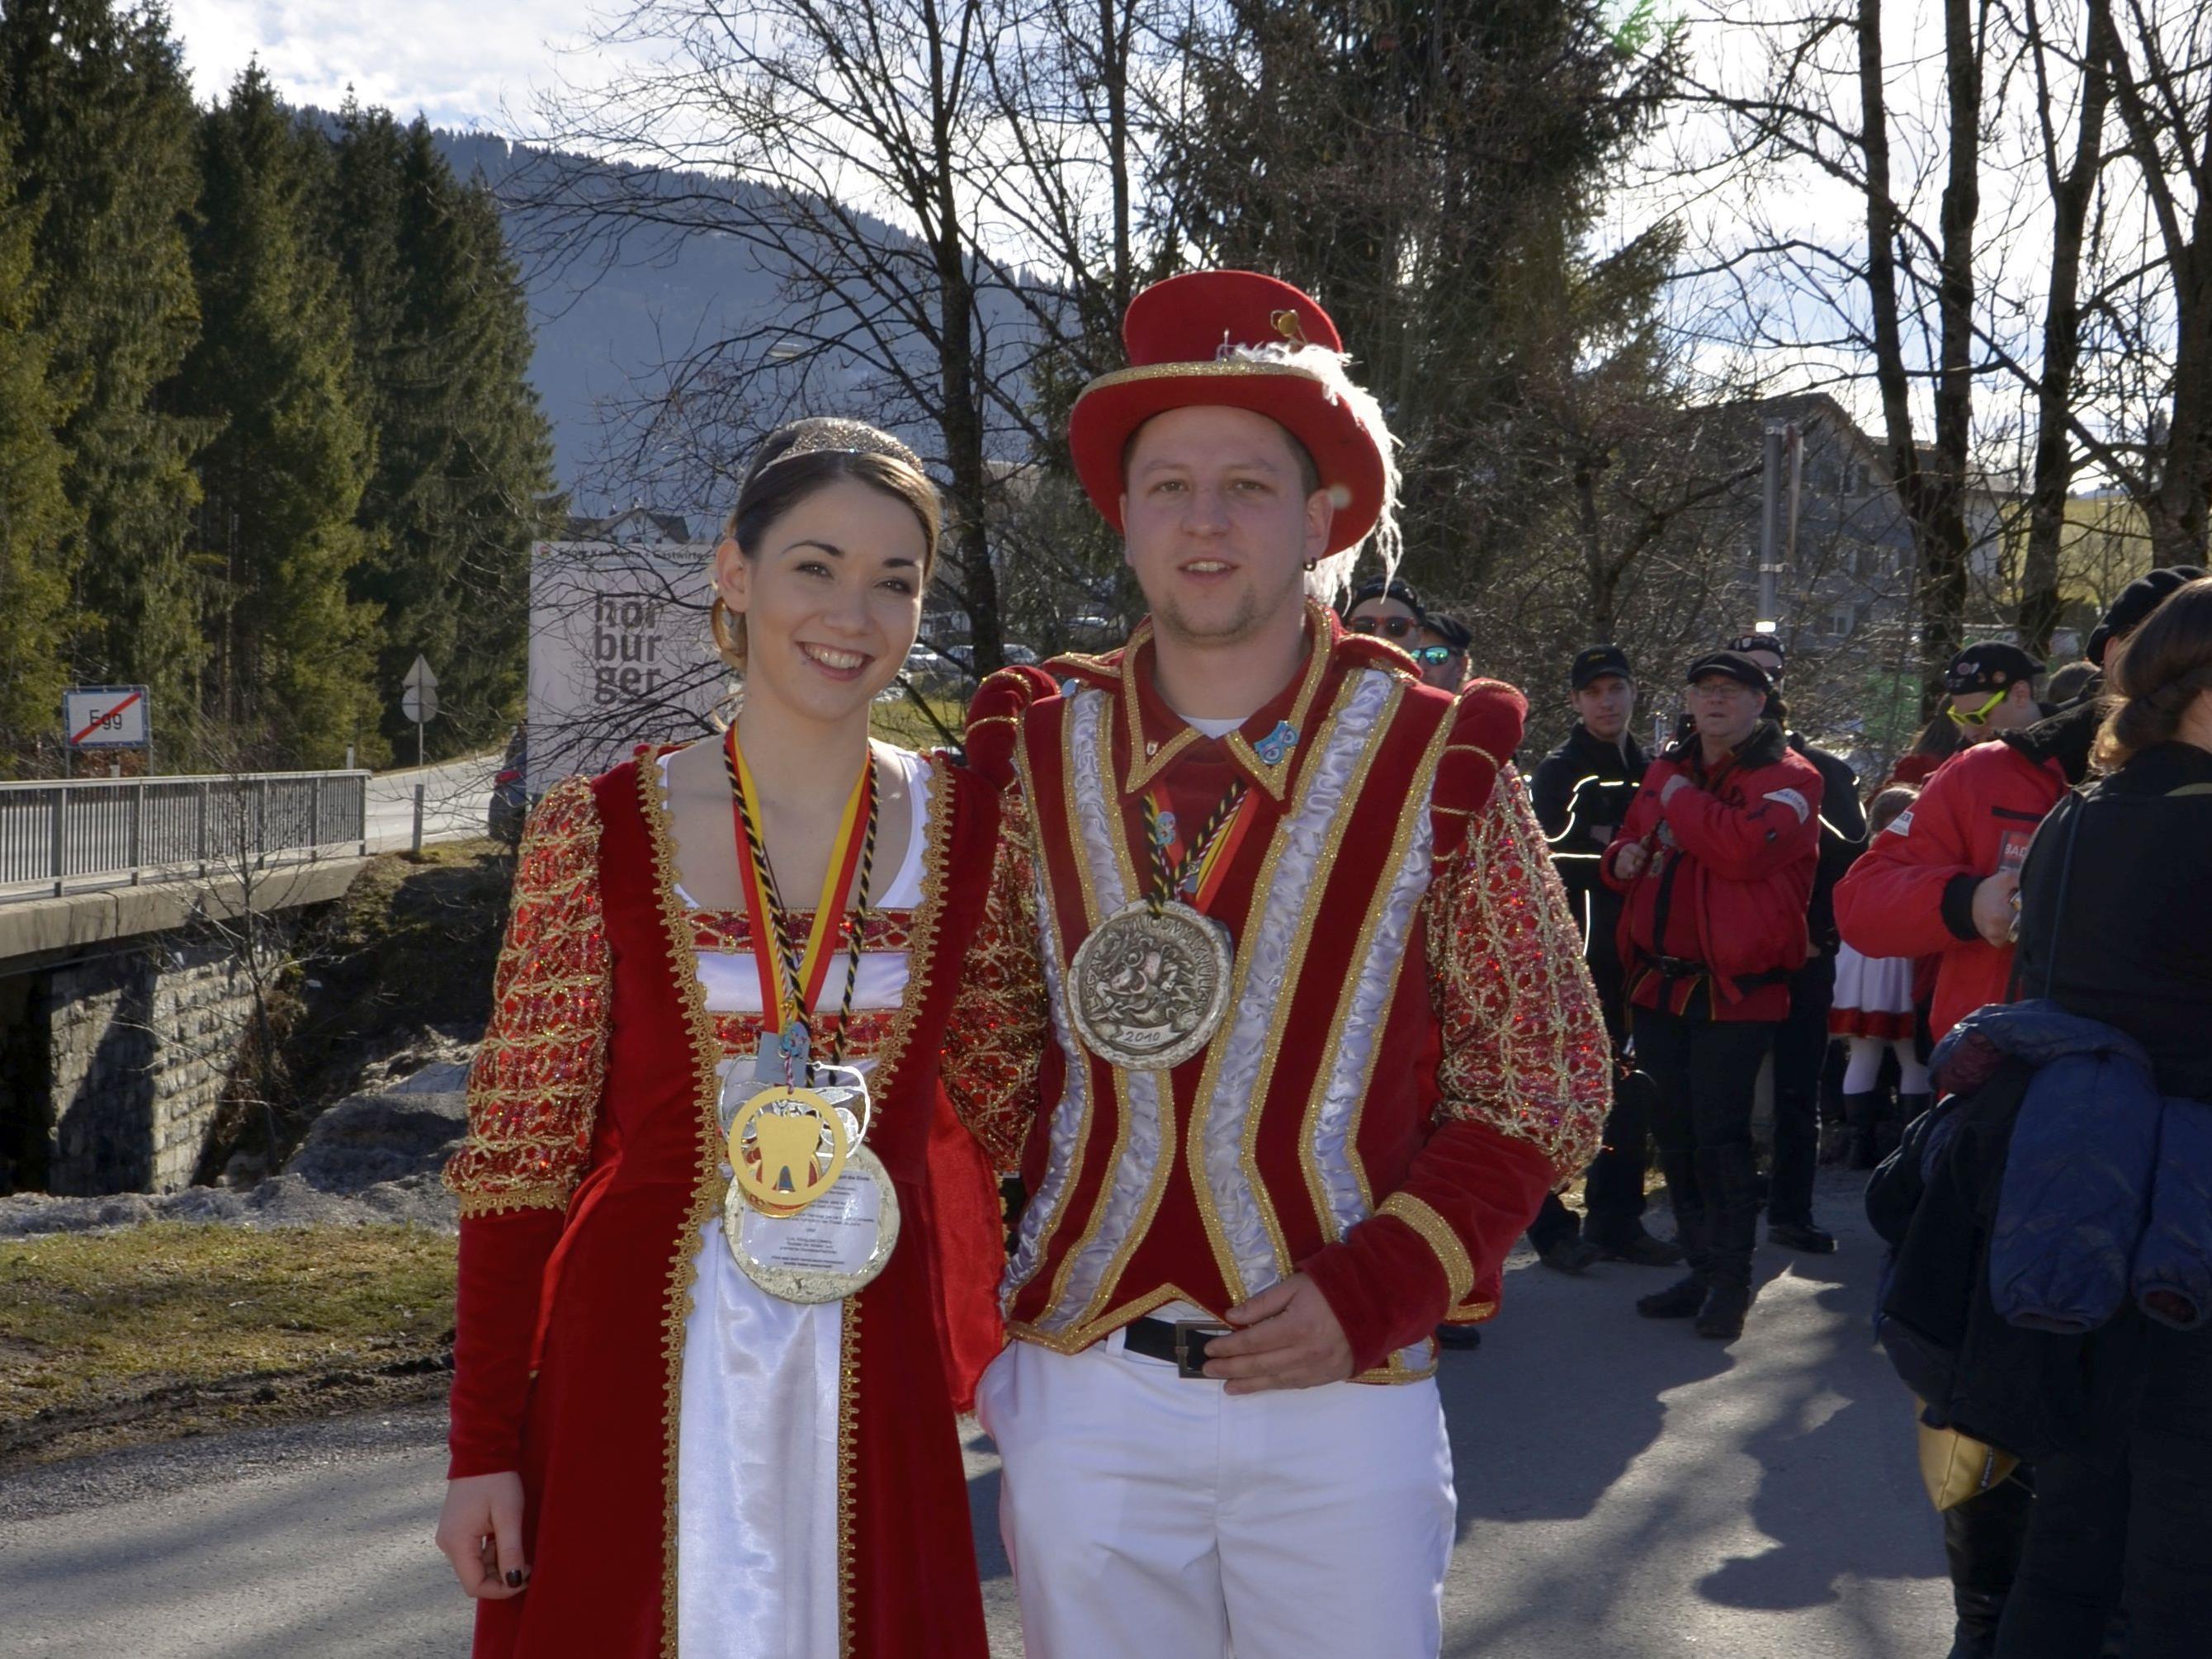 Prinzessin Margot I. und Prinz Lukas I.